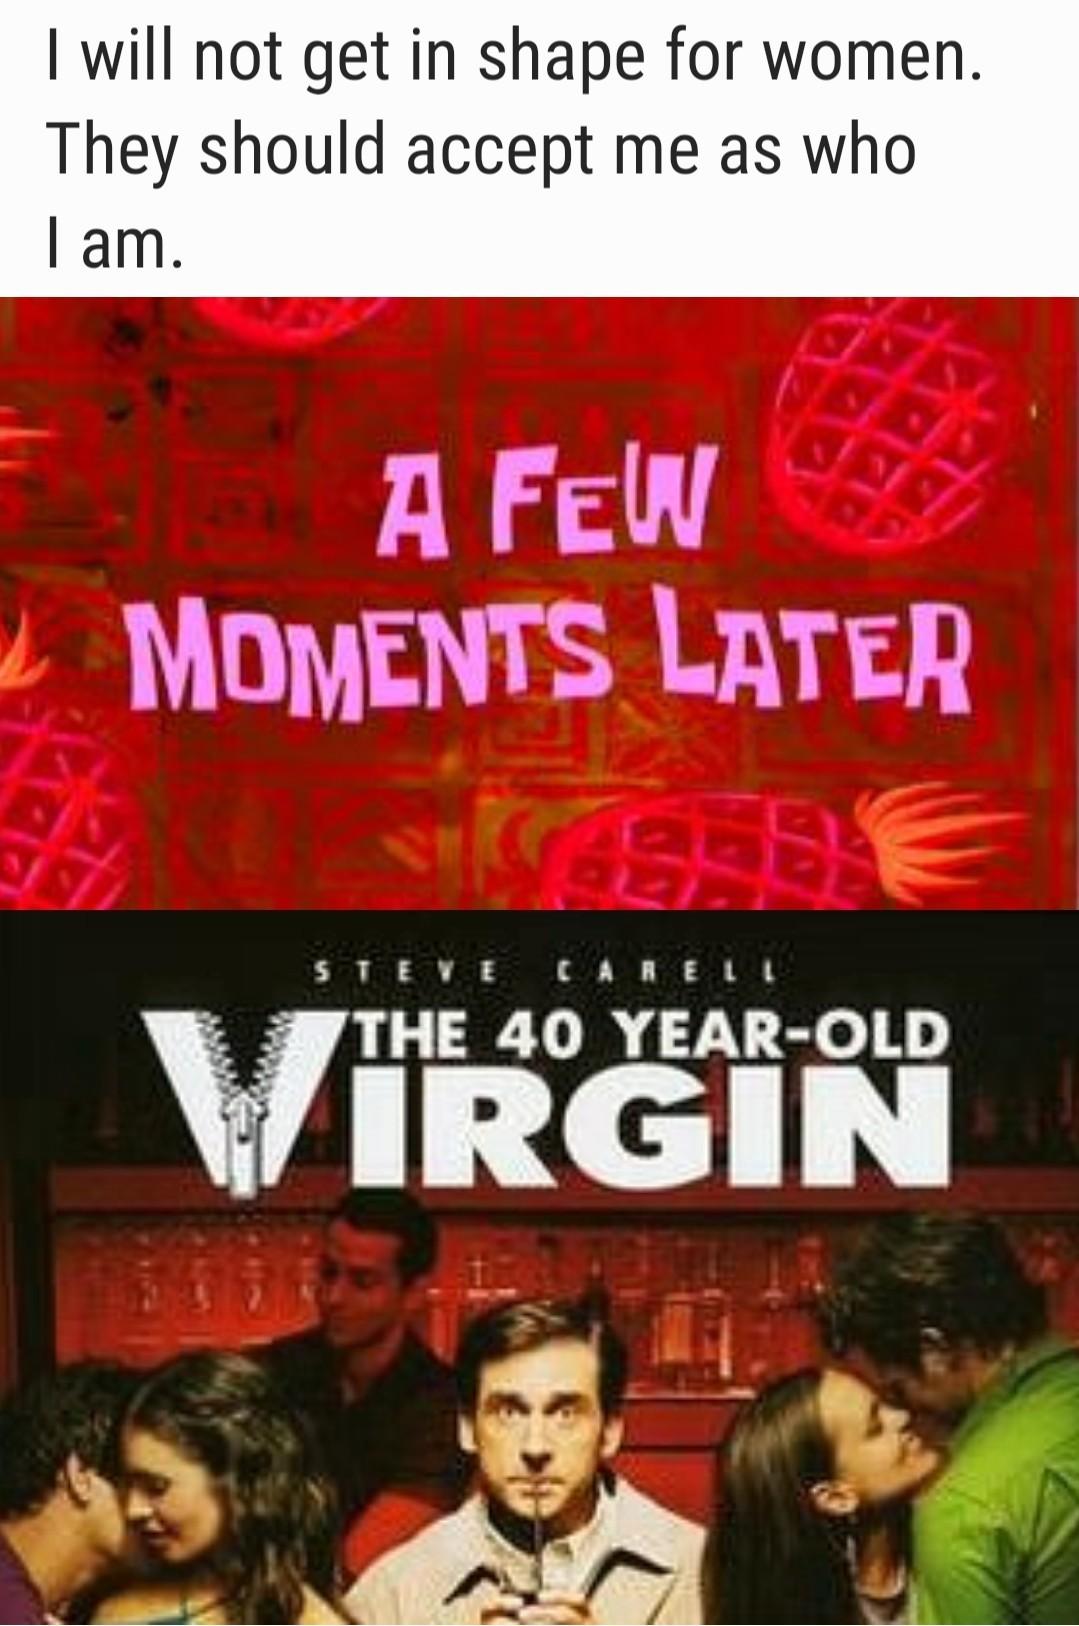 My life in a nutshell - meme